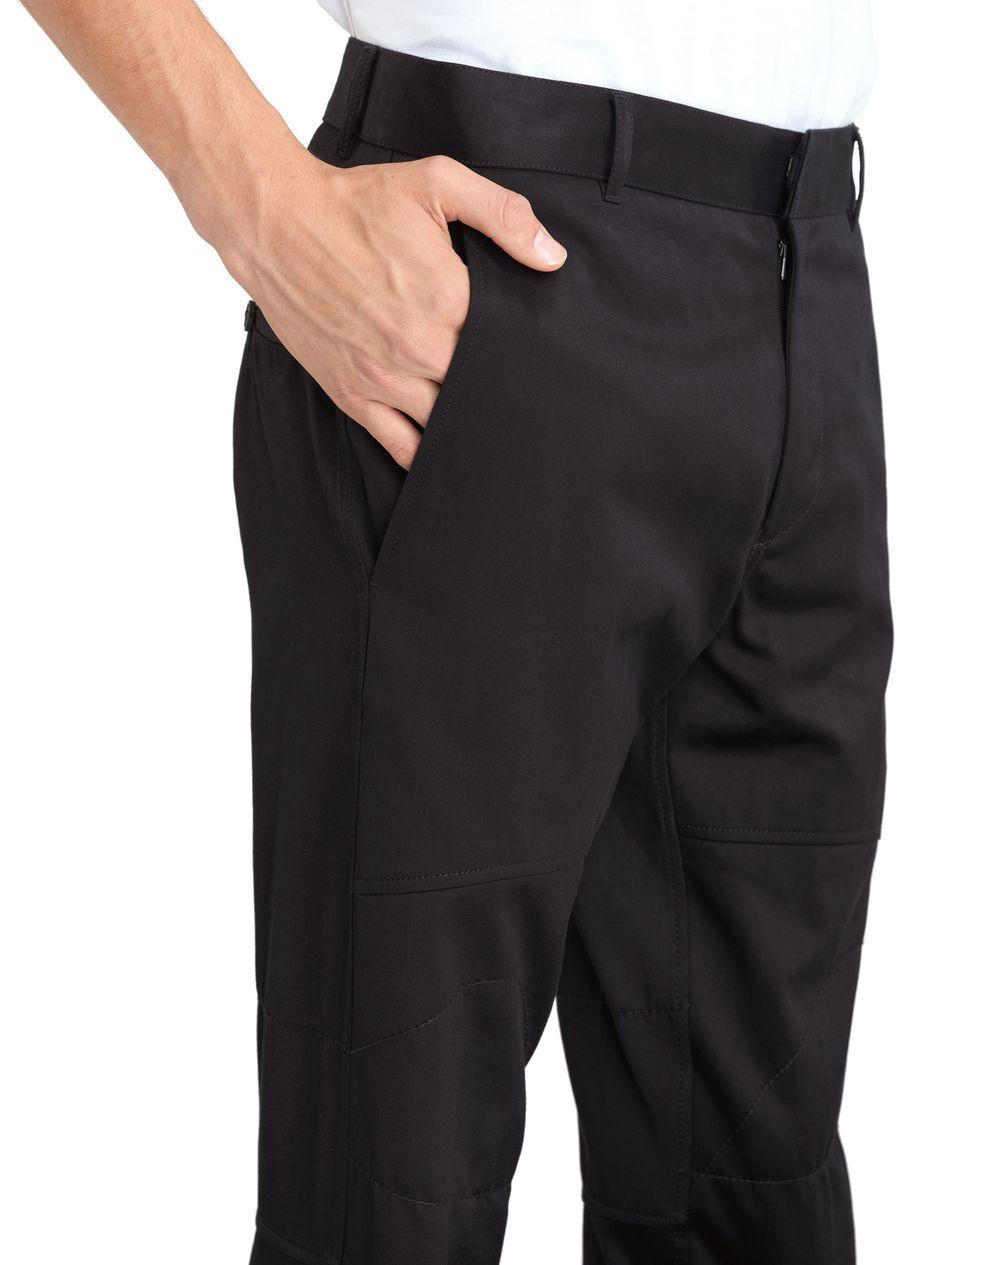 BLACK BIKER PANTS - Lanvin